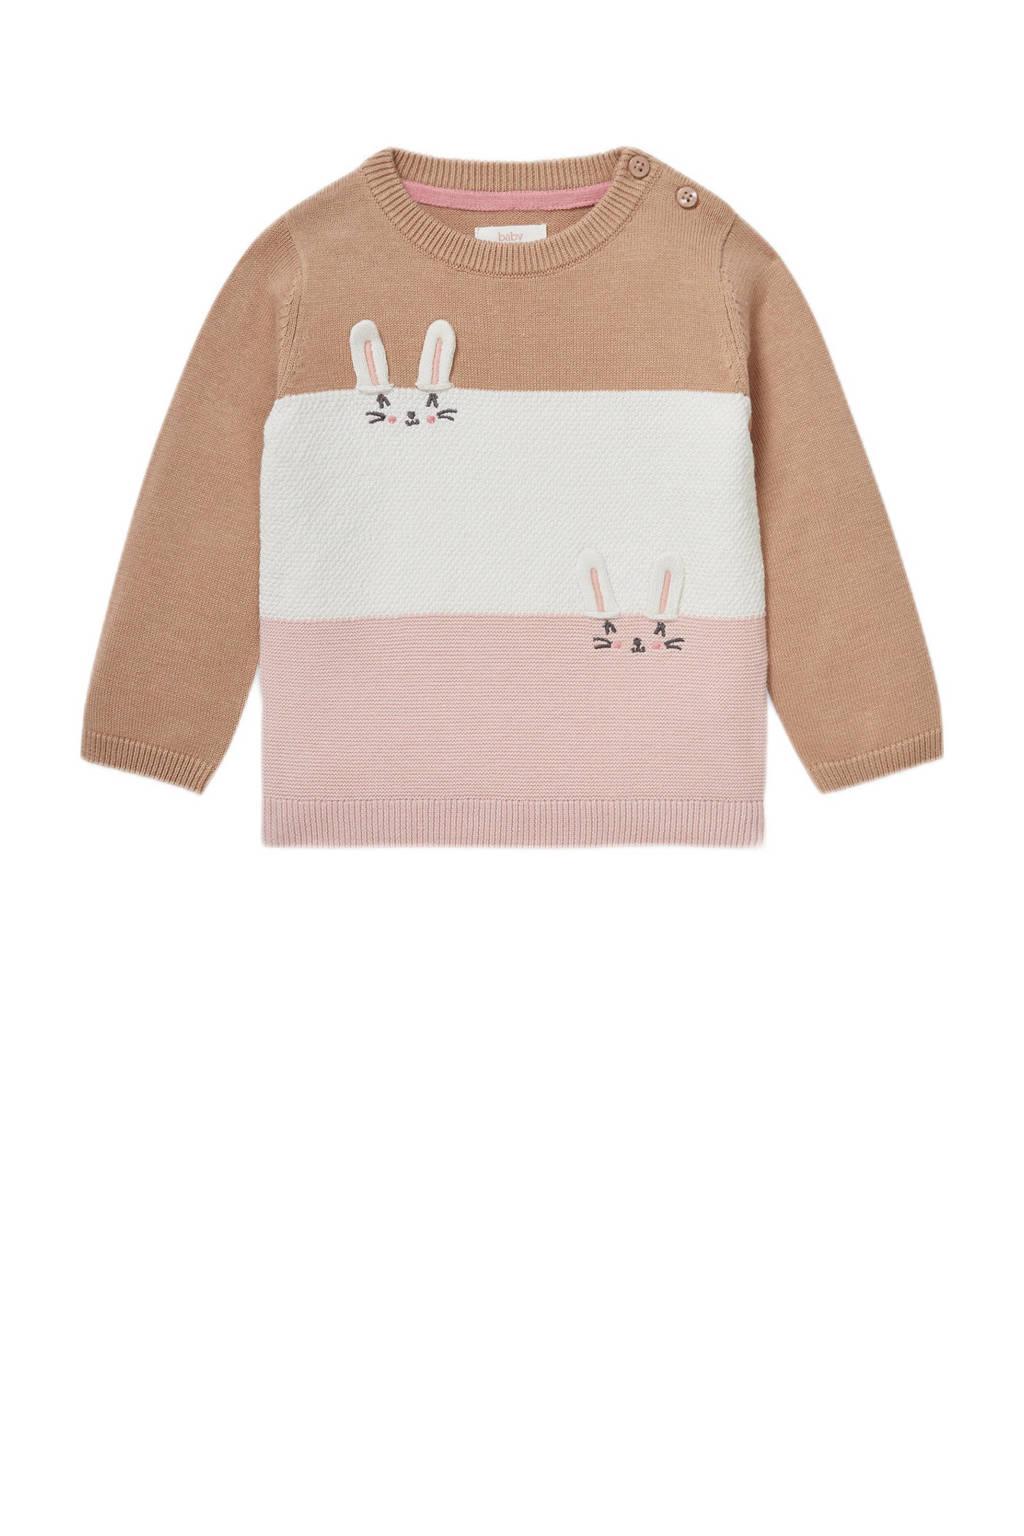 C&A Baby Club gestreepte trui beige/ecru/roze, Beige/ecru/roze